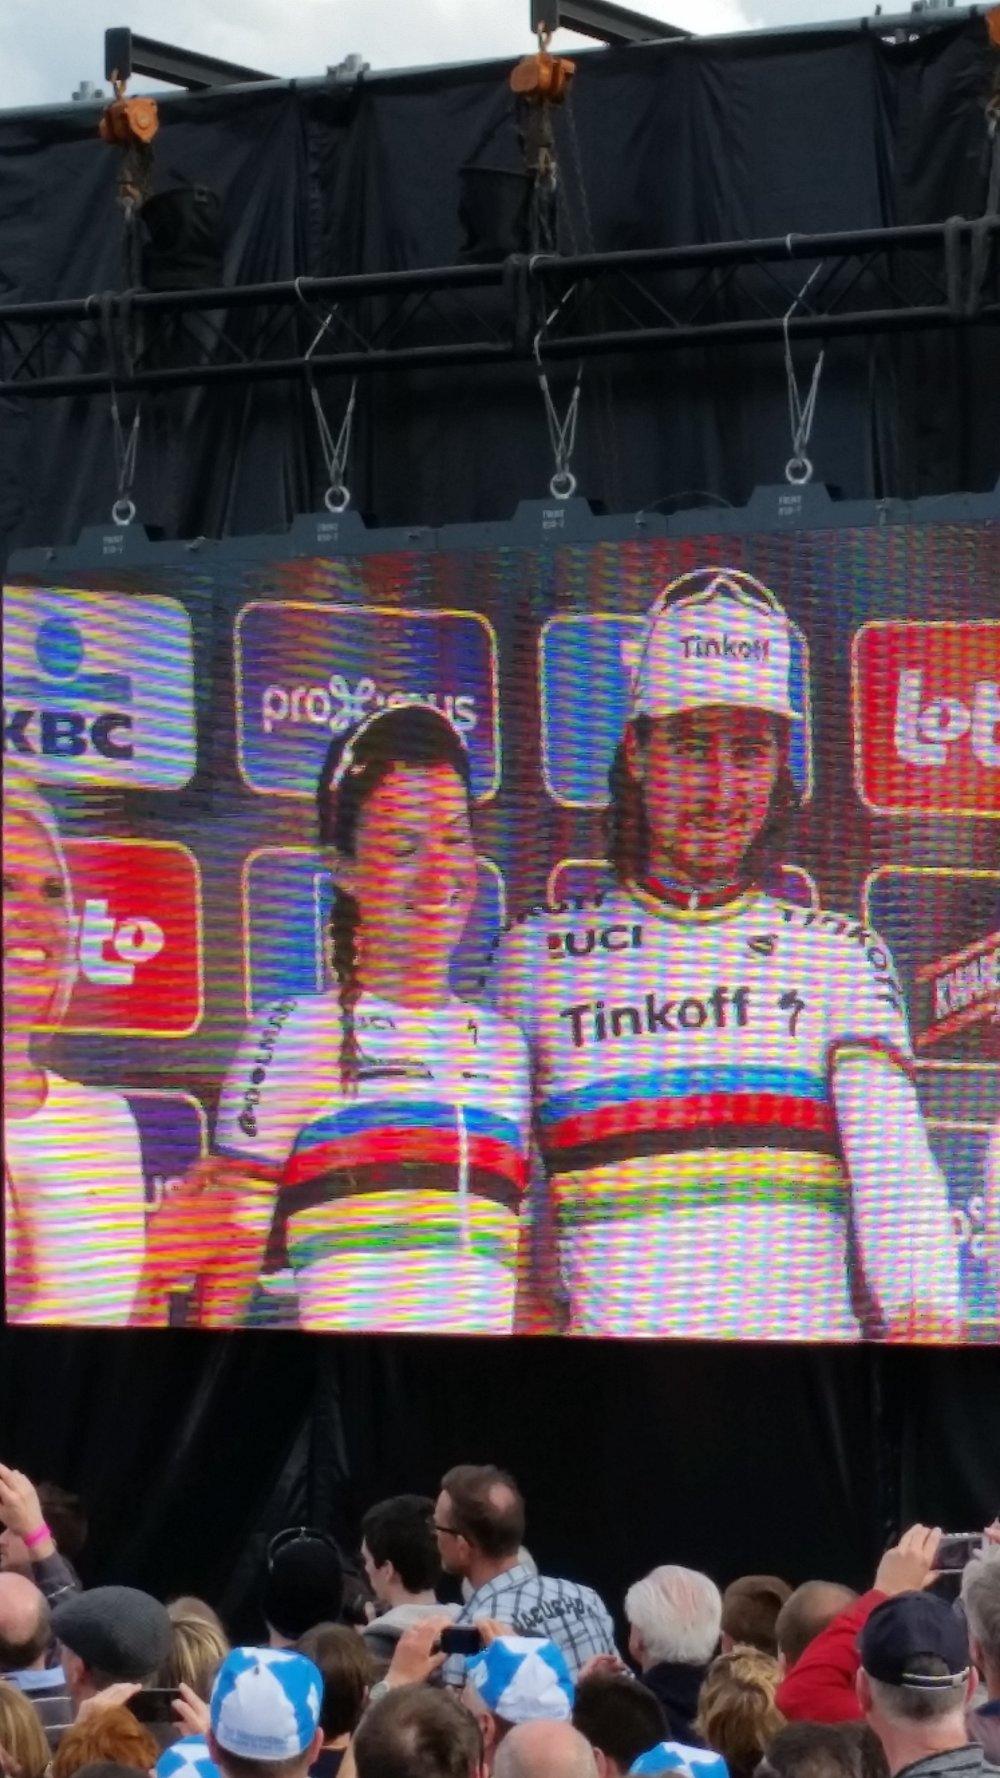 Flanders_world_champs.jpg